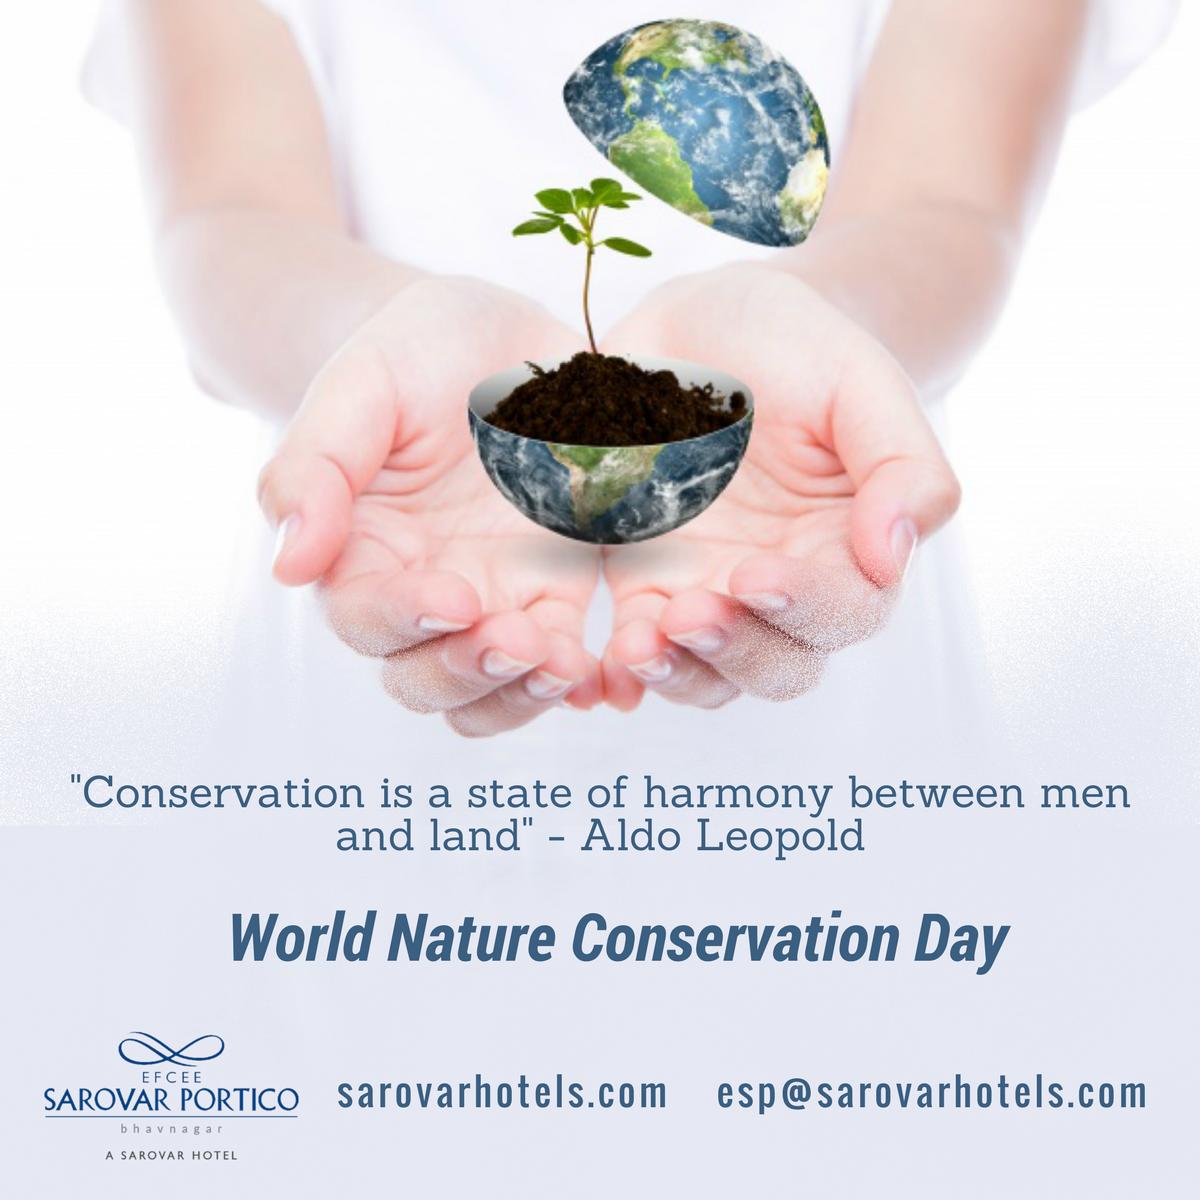 World Nature Conservation Day Keralagraminbank Kgb Natureconservationday Protectnature In 2020 Nature Conservation Nature International Day